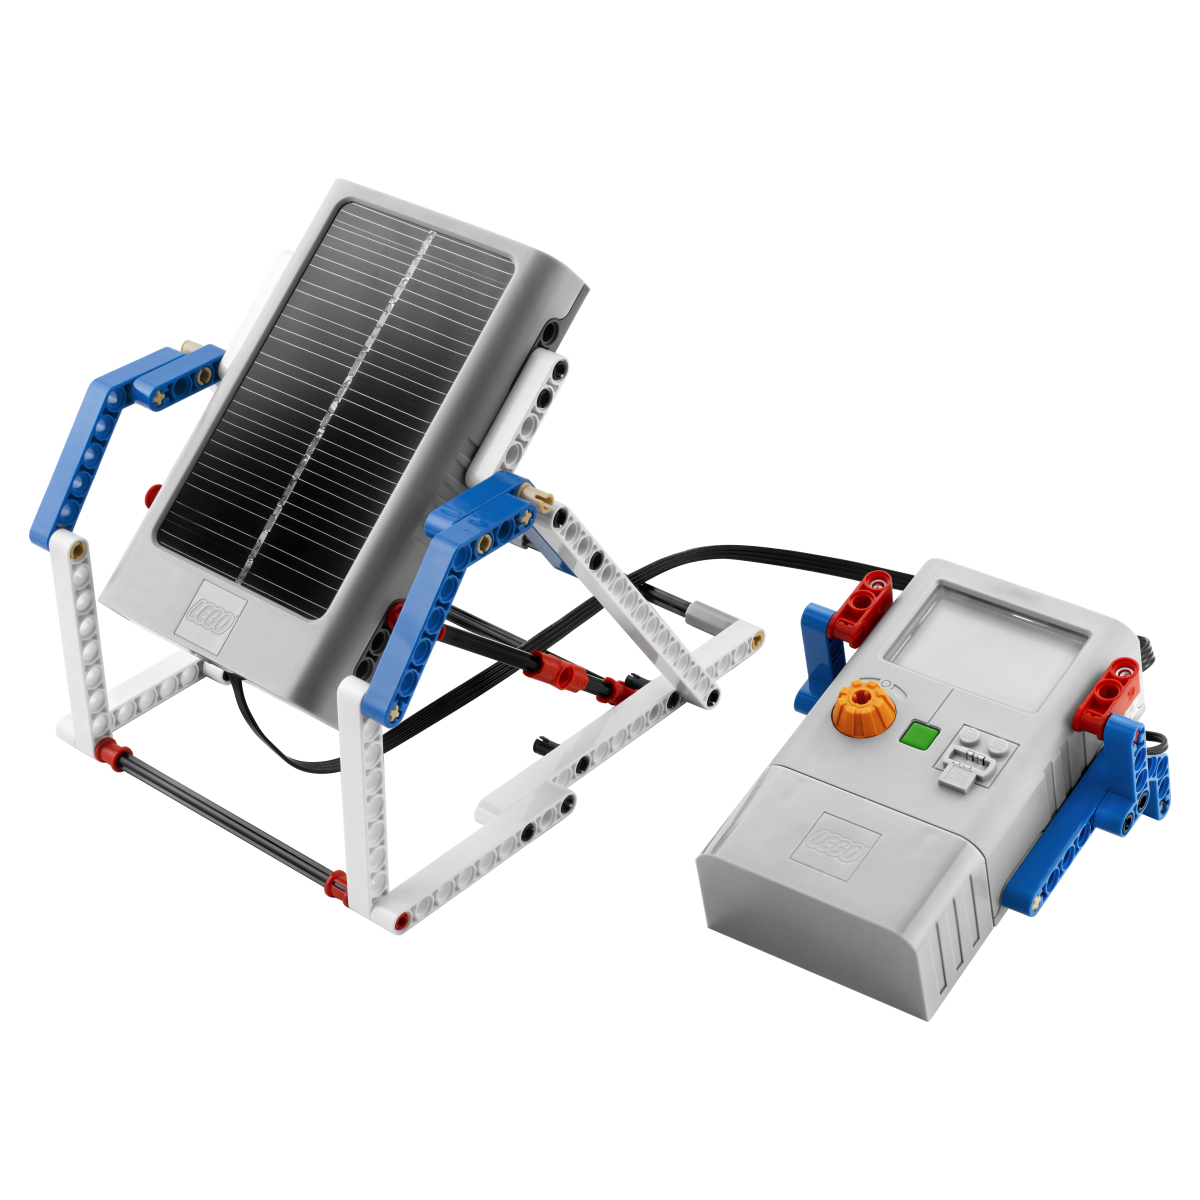 Lego Education Renewable Energy Add On Set